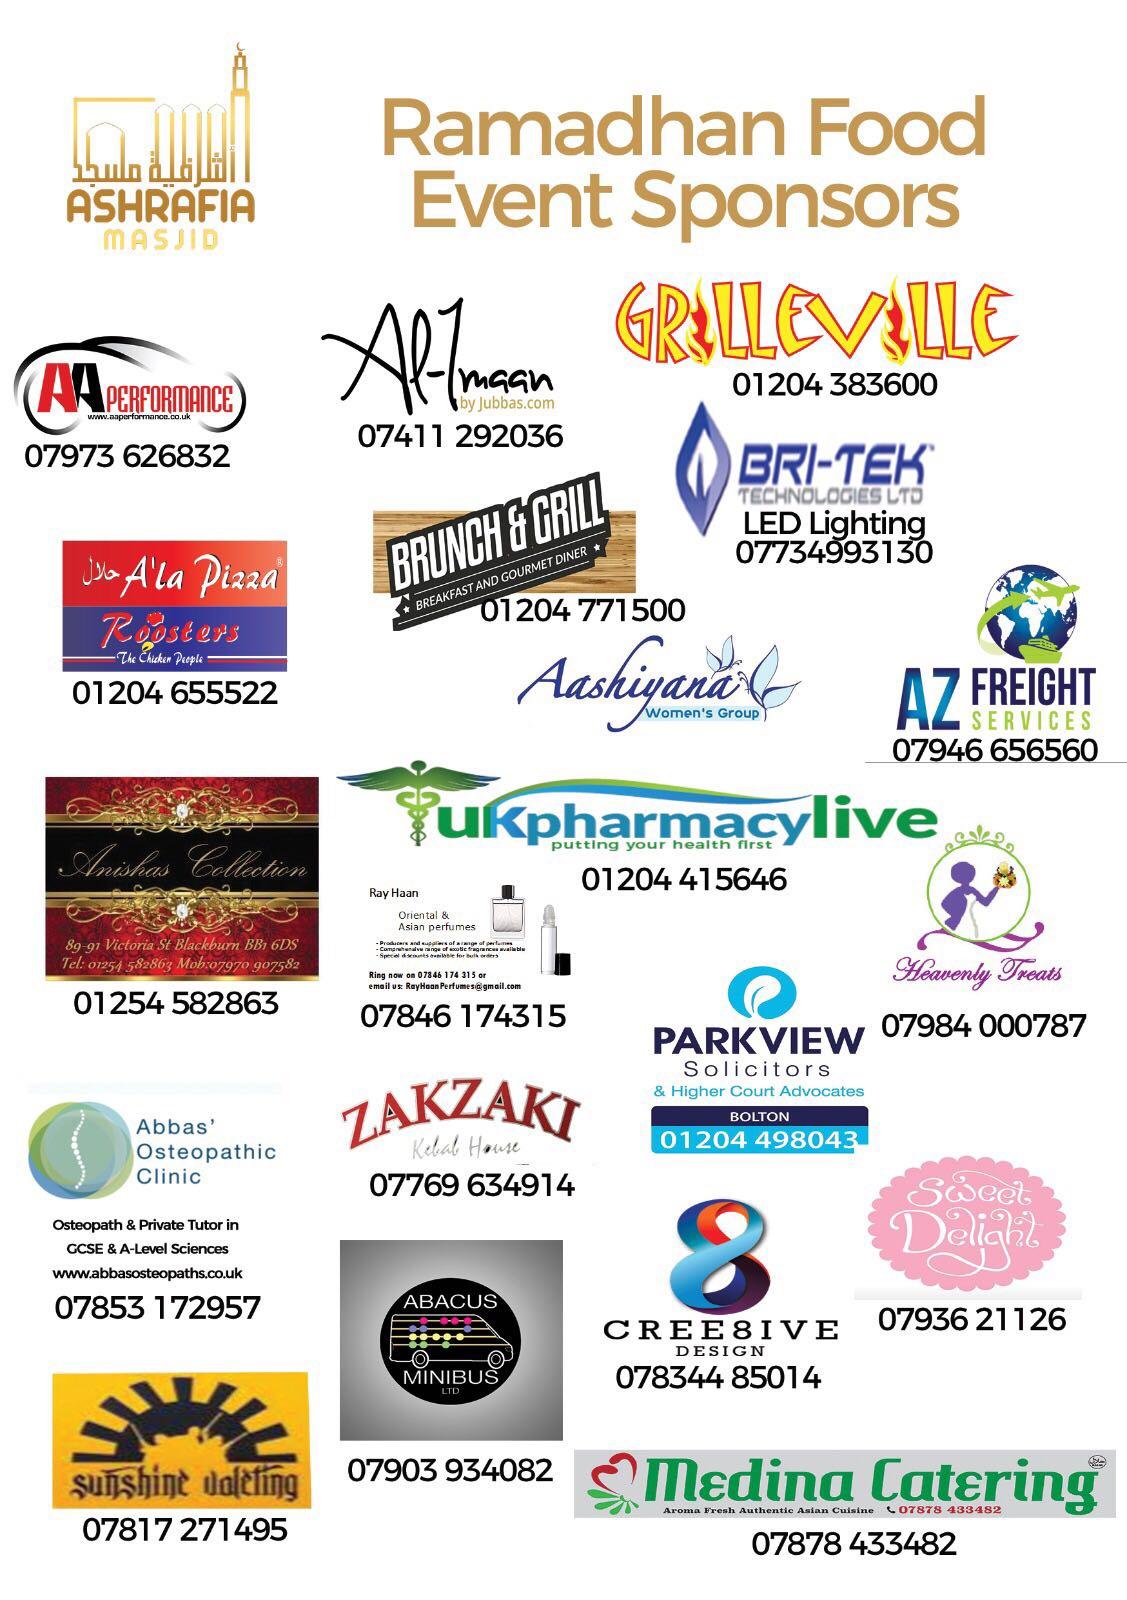 Ramadhan 2017 Food Event Sponsors